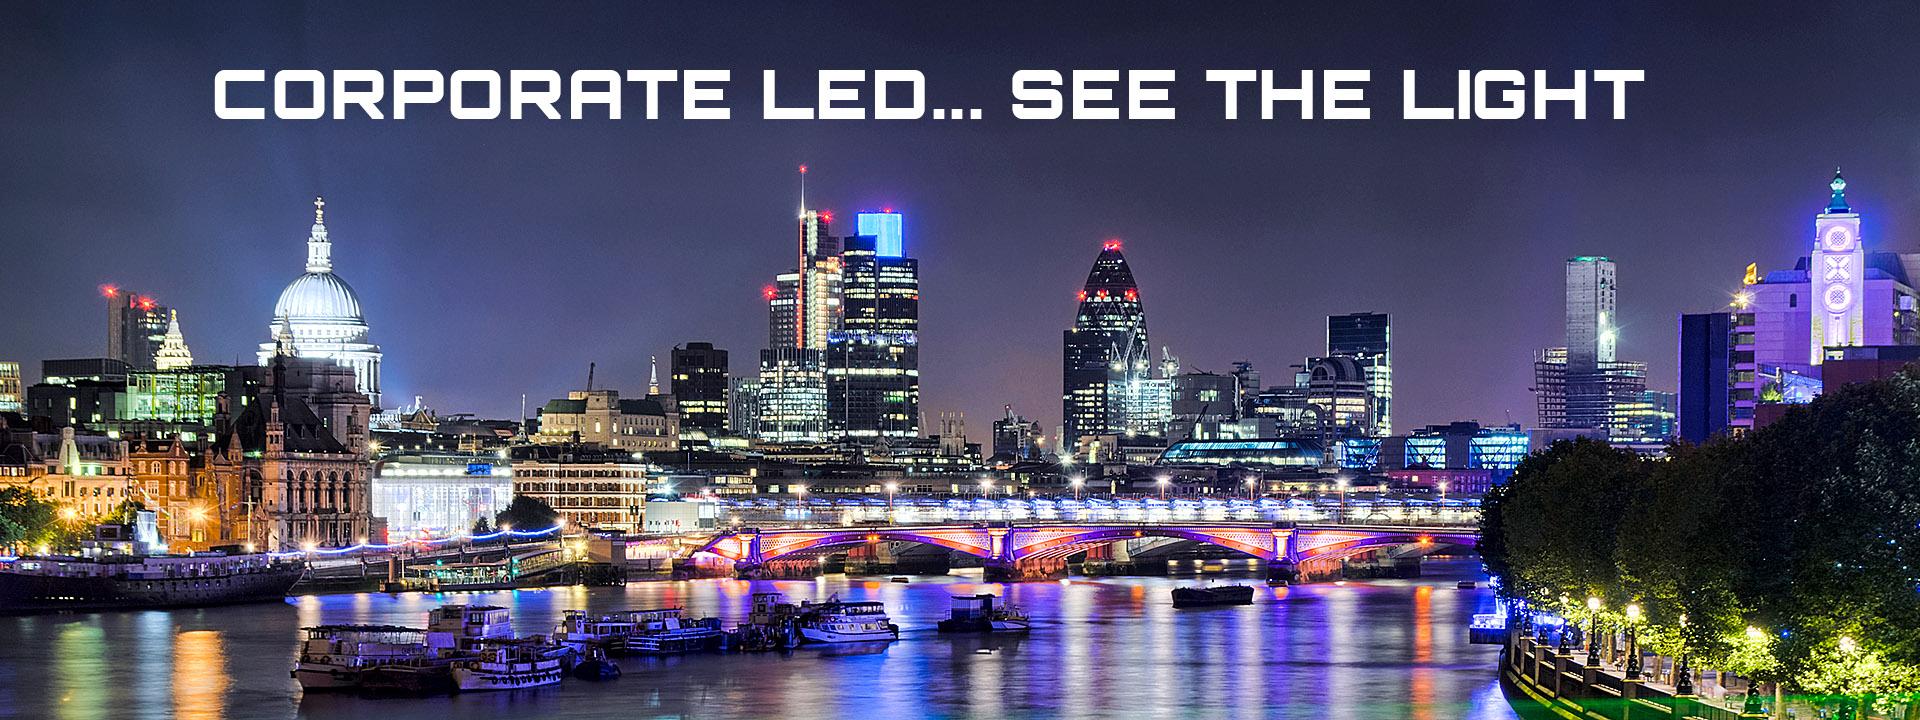 Corporate LED